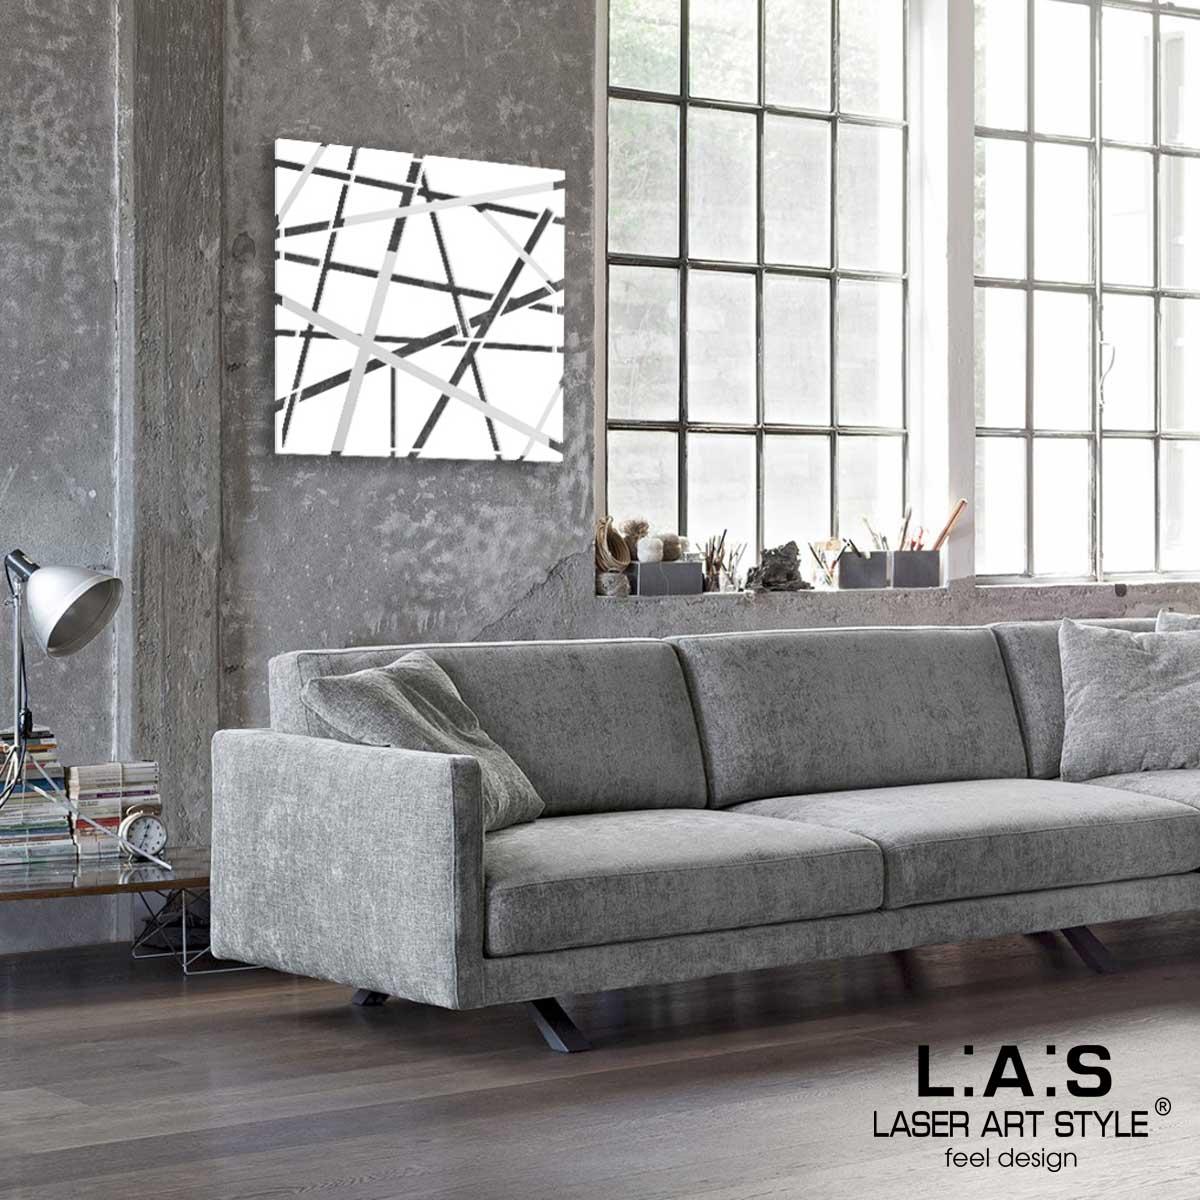 L:A:S - Laser Art Style - QUADRO MODERNO DESIGN MINIMAL – SI-095 BIANCO